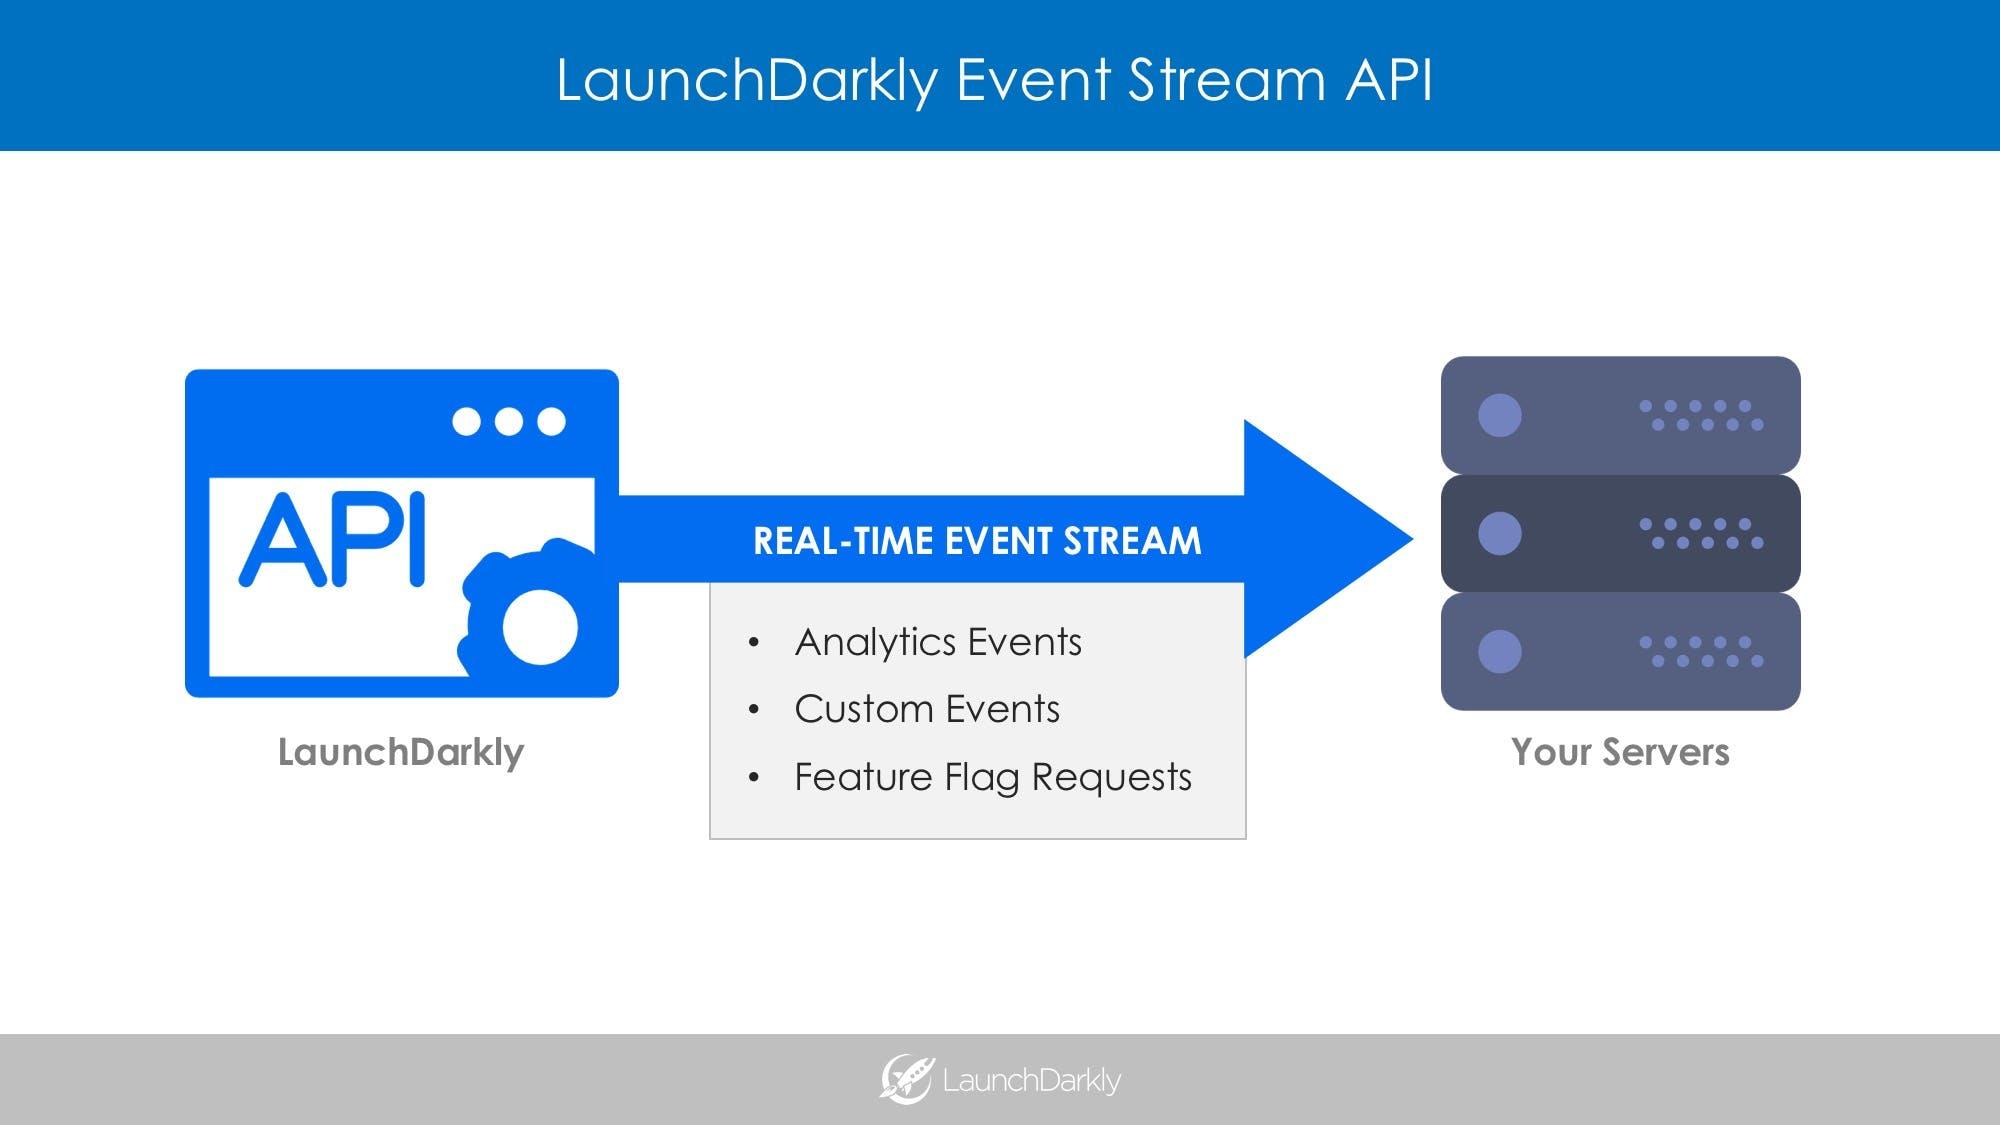 LaunchDarkly Event Stream API A/B Testing Analytics and Data